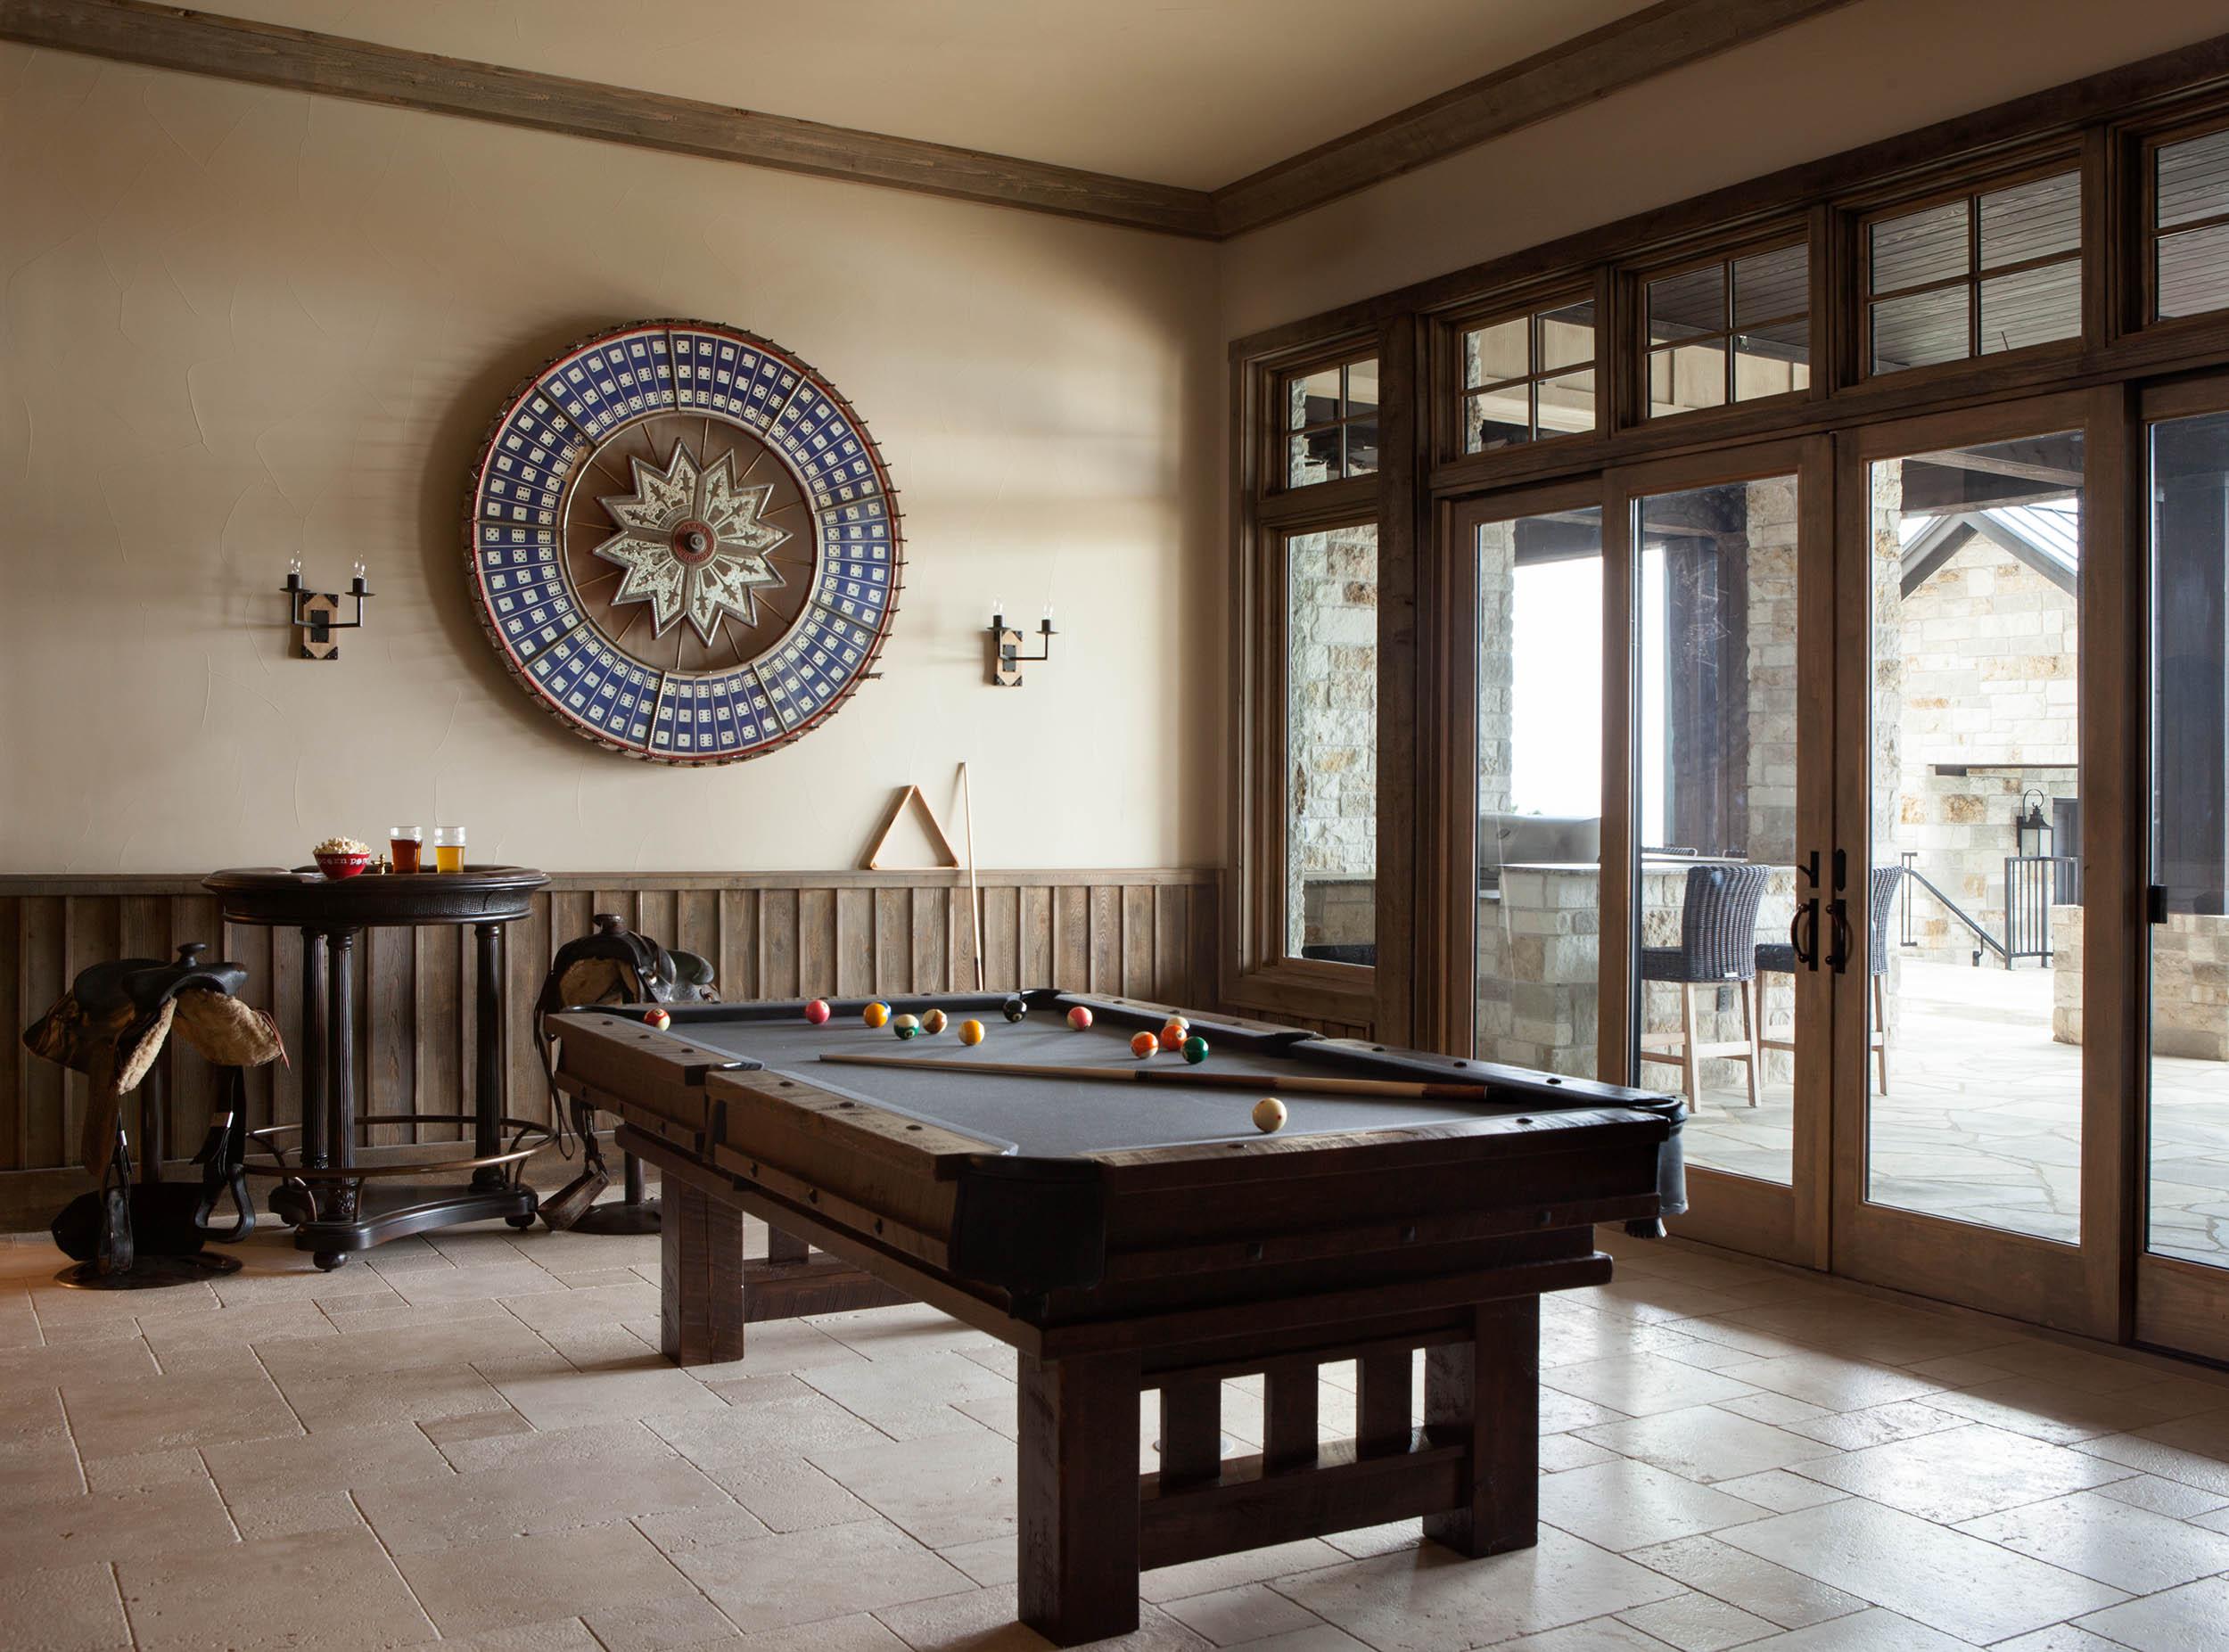 austin-house-play-room-interior-design.jpg